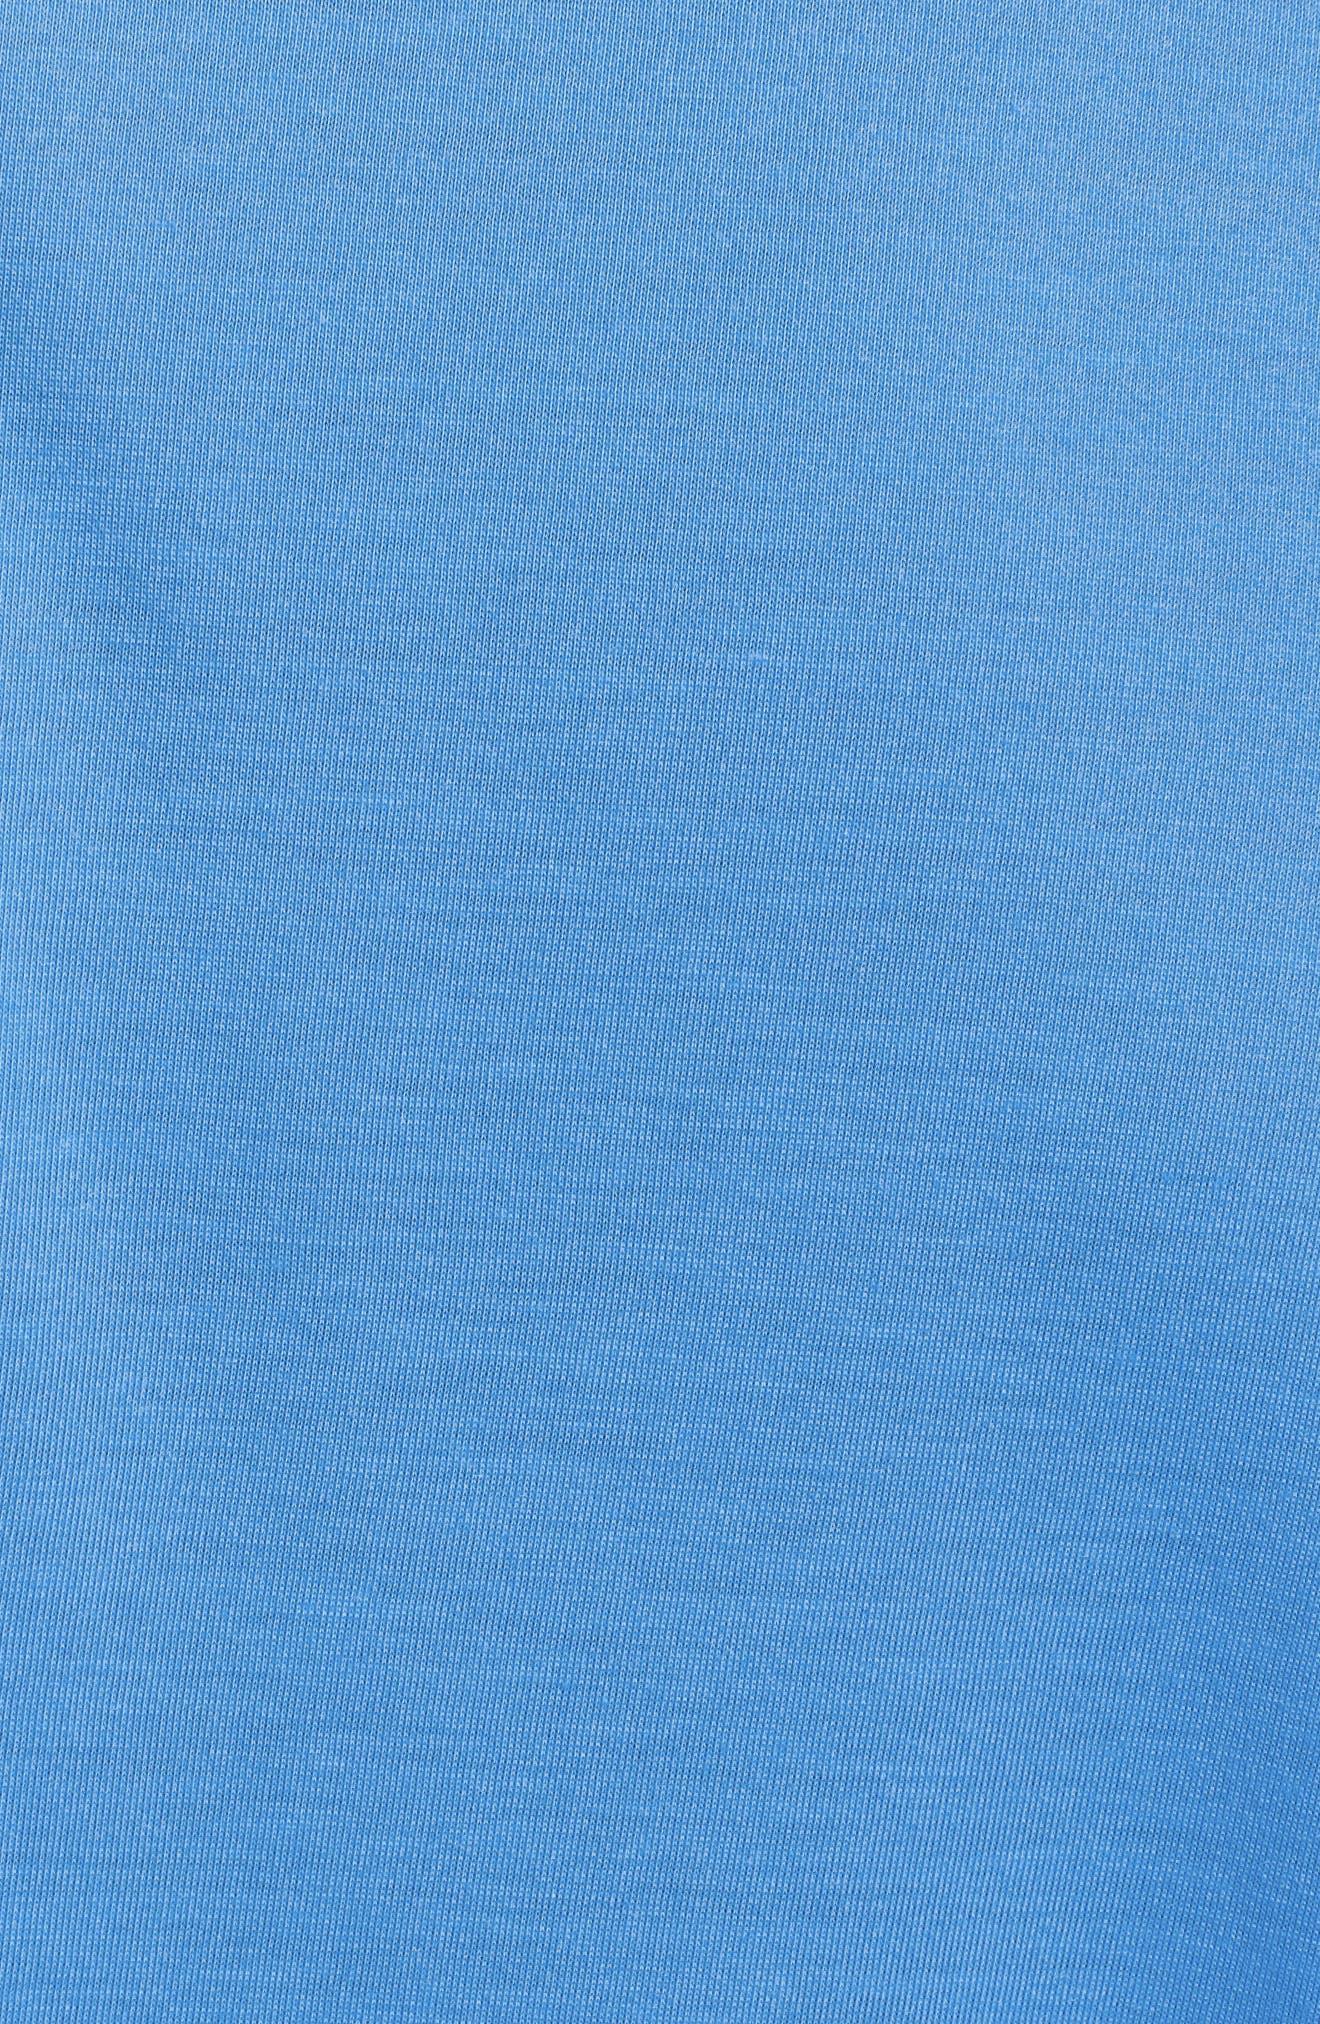 Threadborne Quarter-Zip Performance Shirt,                             Alternate thumbnail 5, color,                             Mako Blue / Graphite